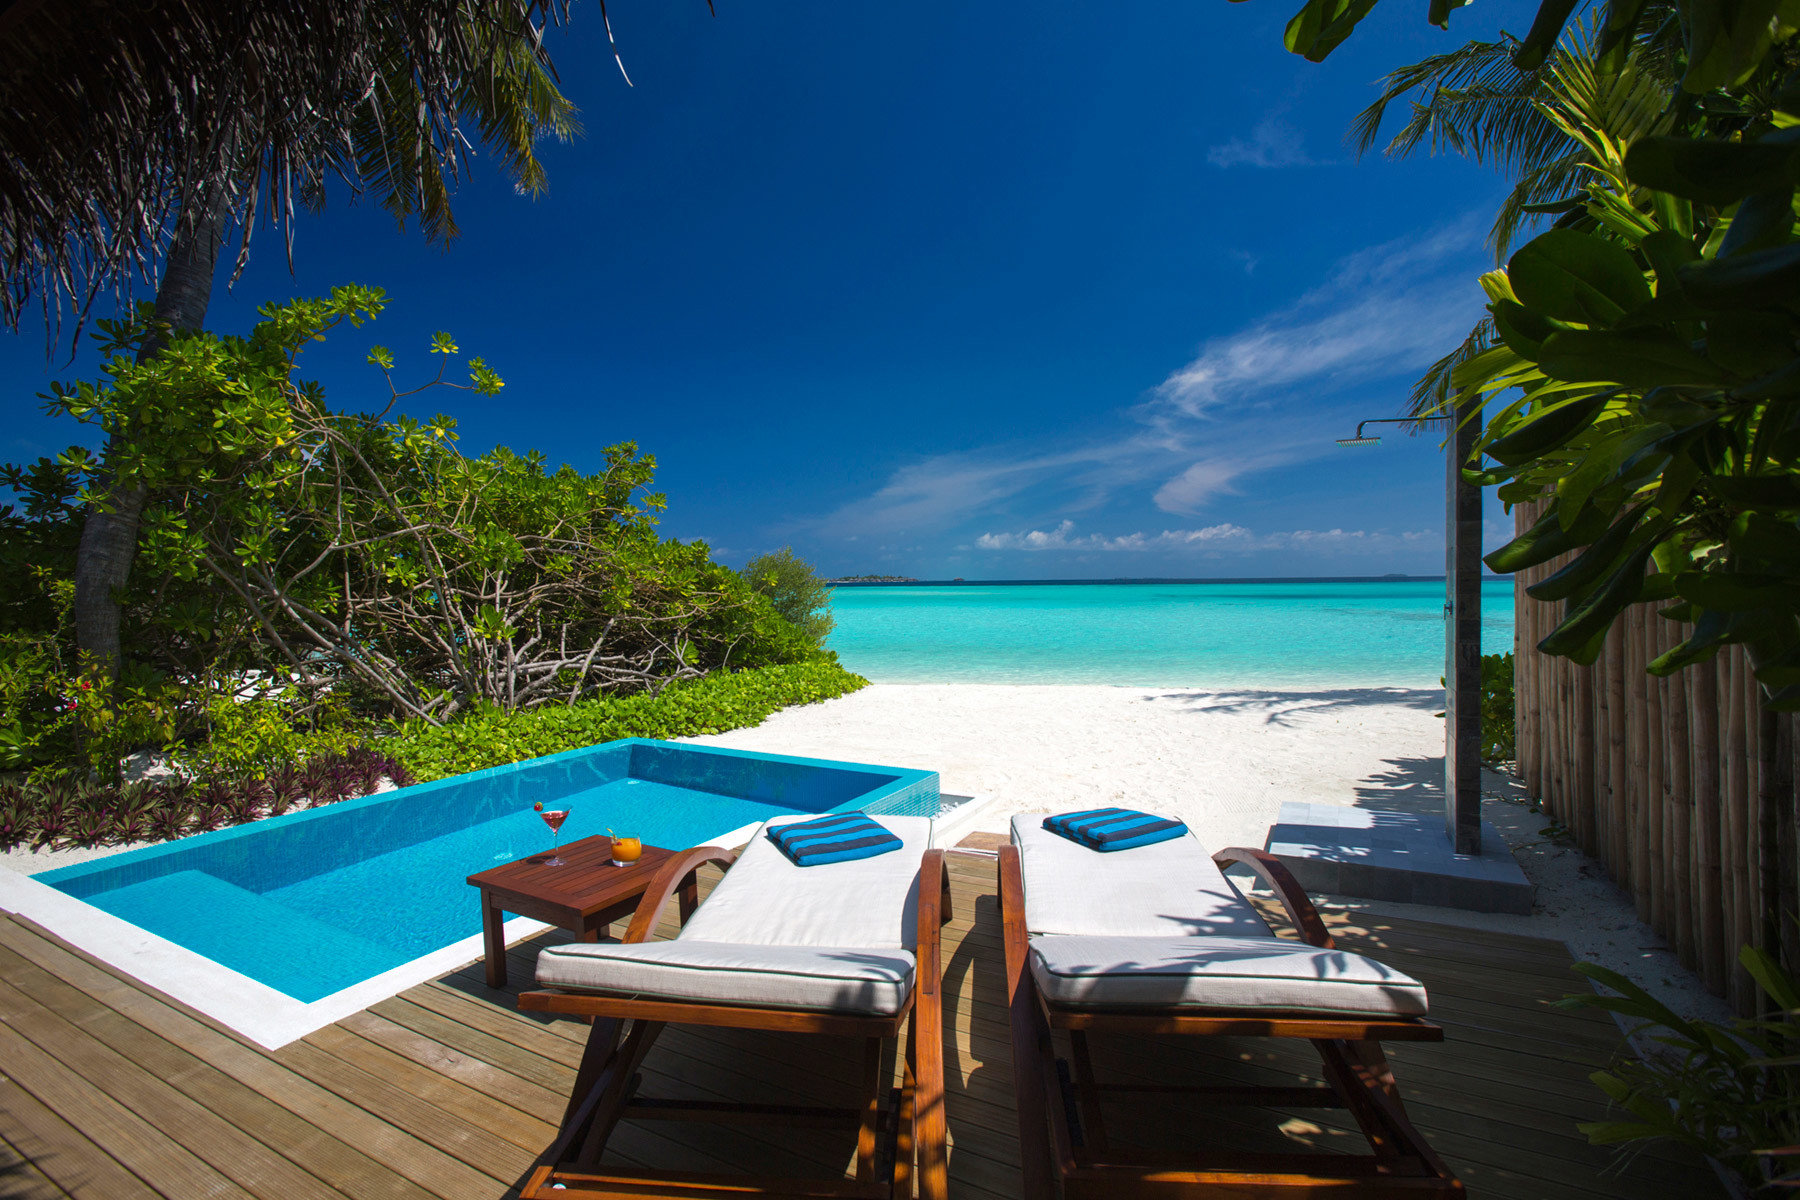 tree water swimming pool leisure Beach Ocean caribbean Sea Resort blue tropics Villa Lagoon overlooking lined Deck shade